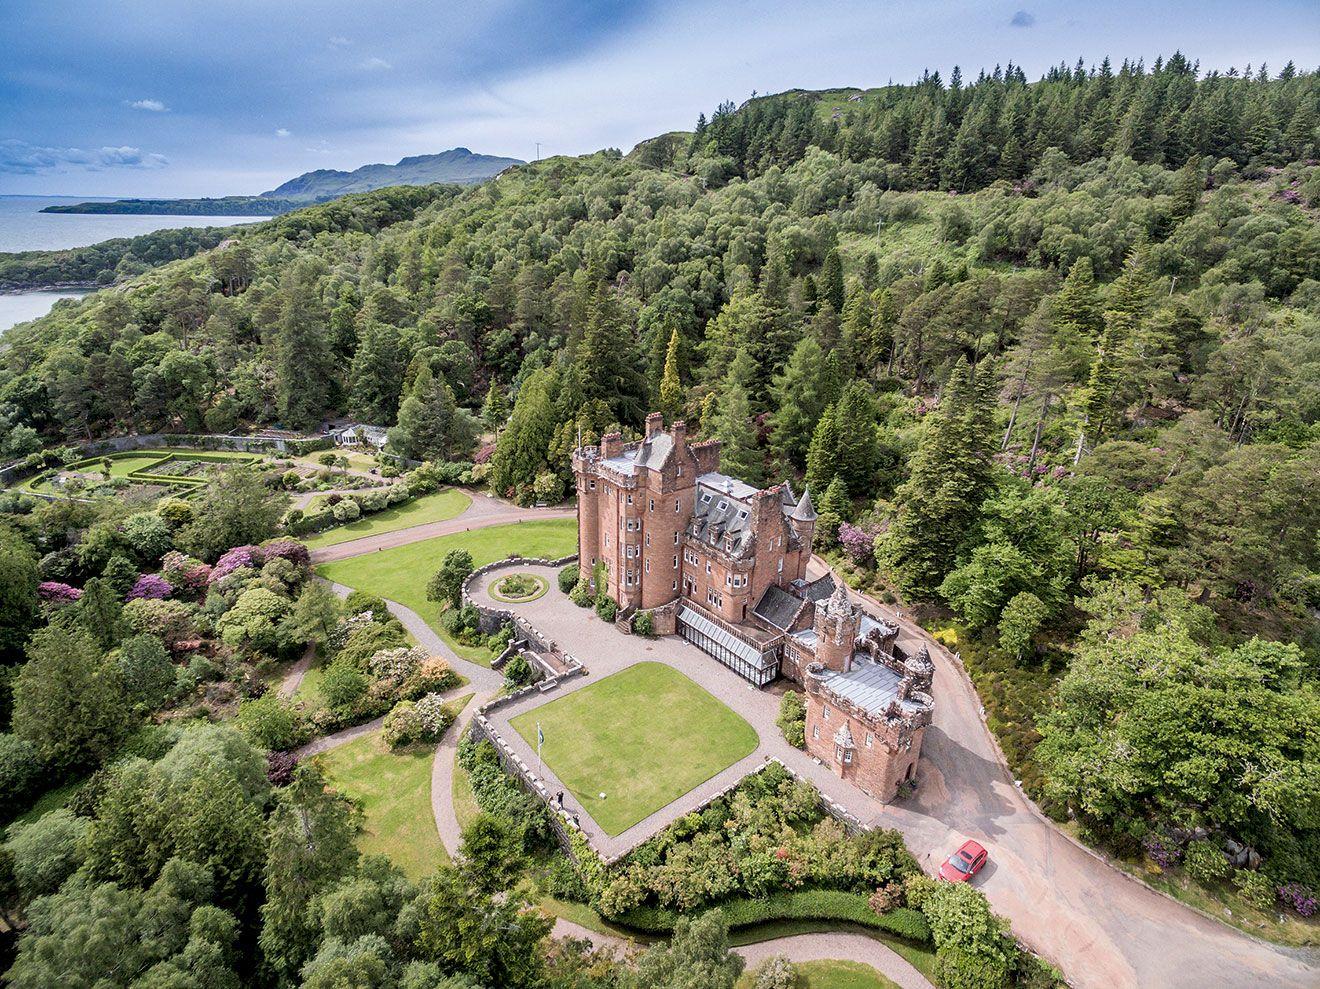 Glenborrodale castle on the ardnamurchan peninsula near acharacle